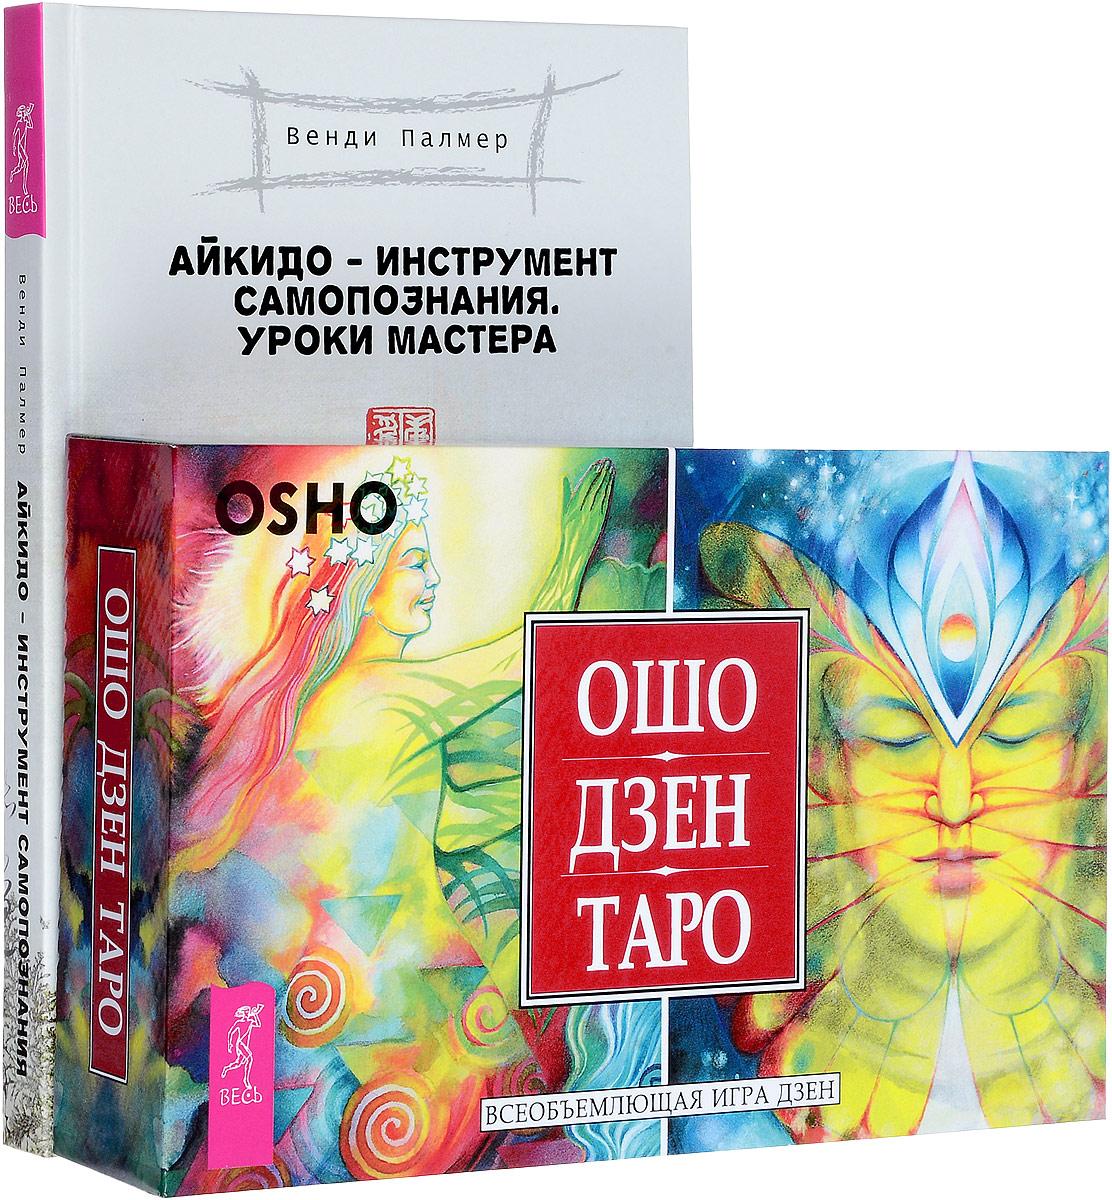 Венди Палмер, Ошо Айкидо - инструмент самопознания. Ошо Дзен Таро (комплект из 2 книг + 79 карт)